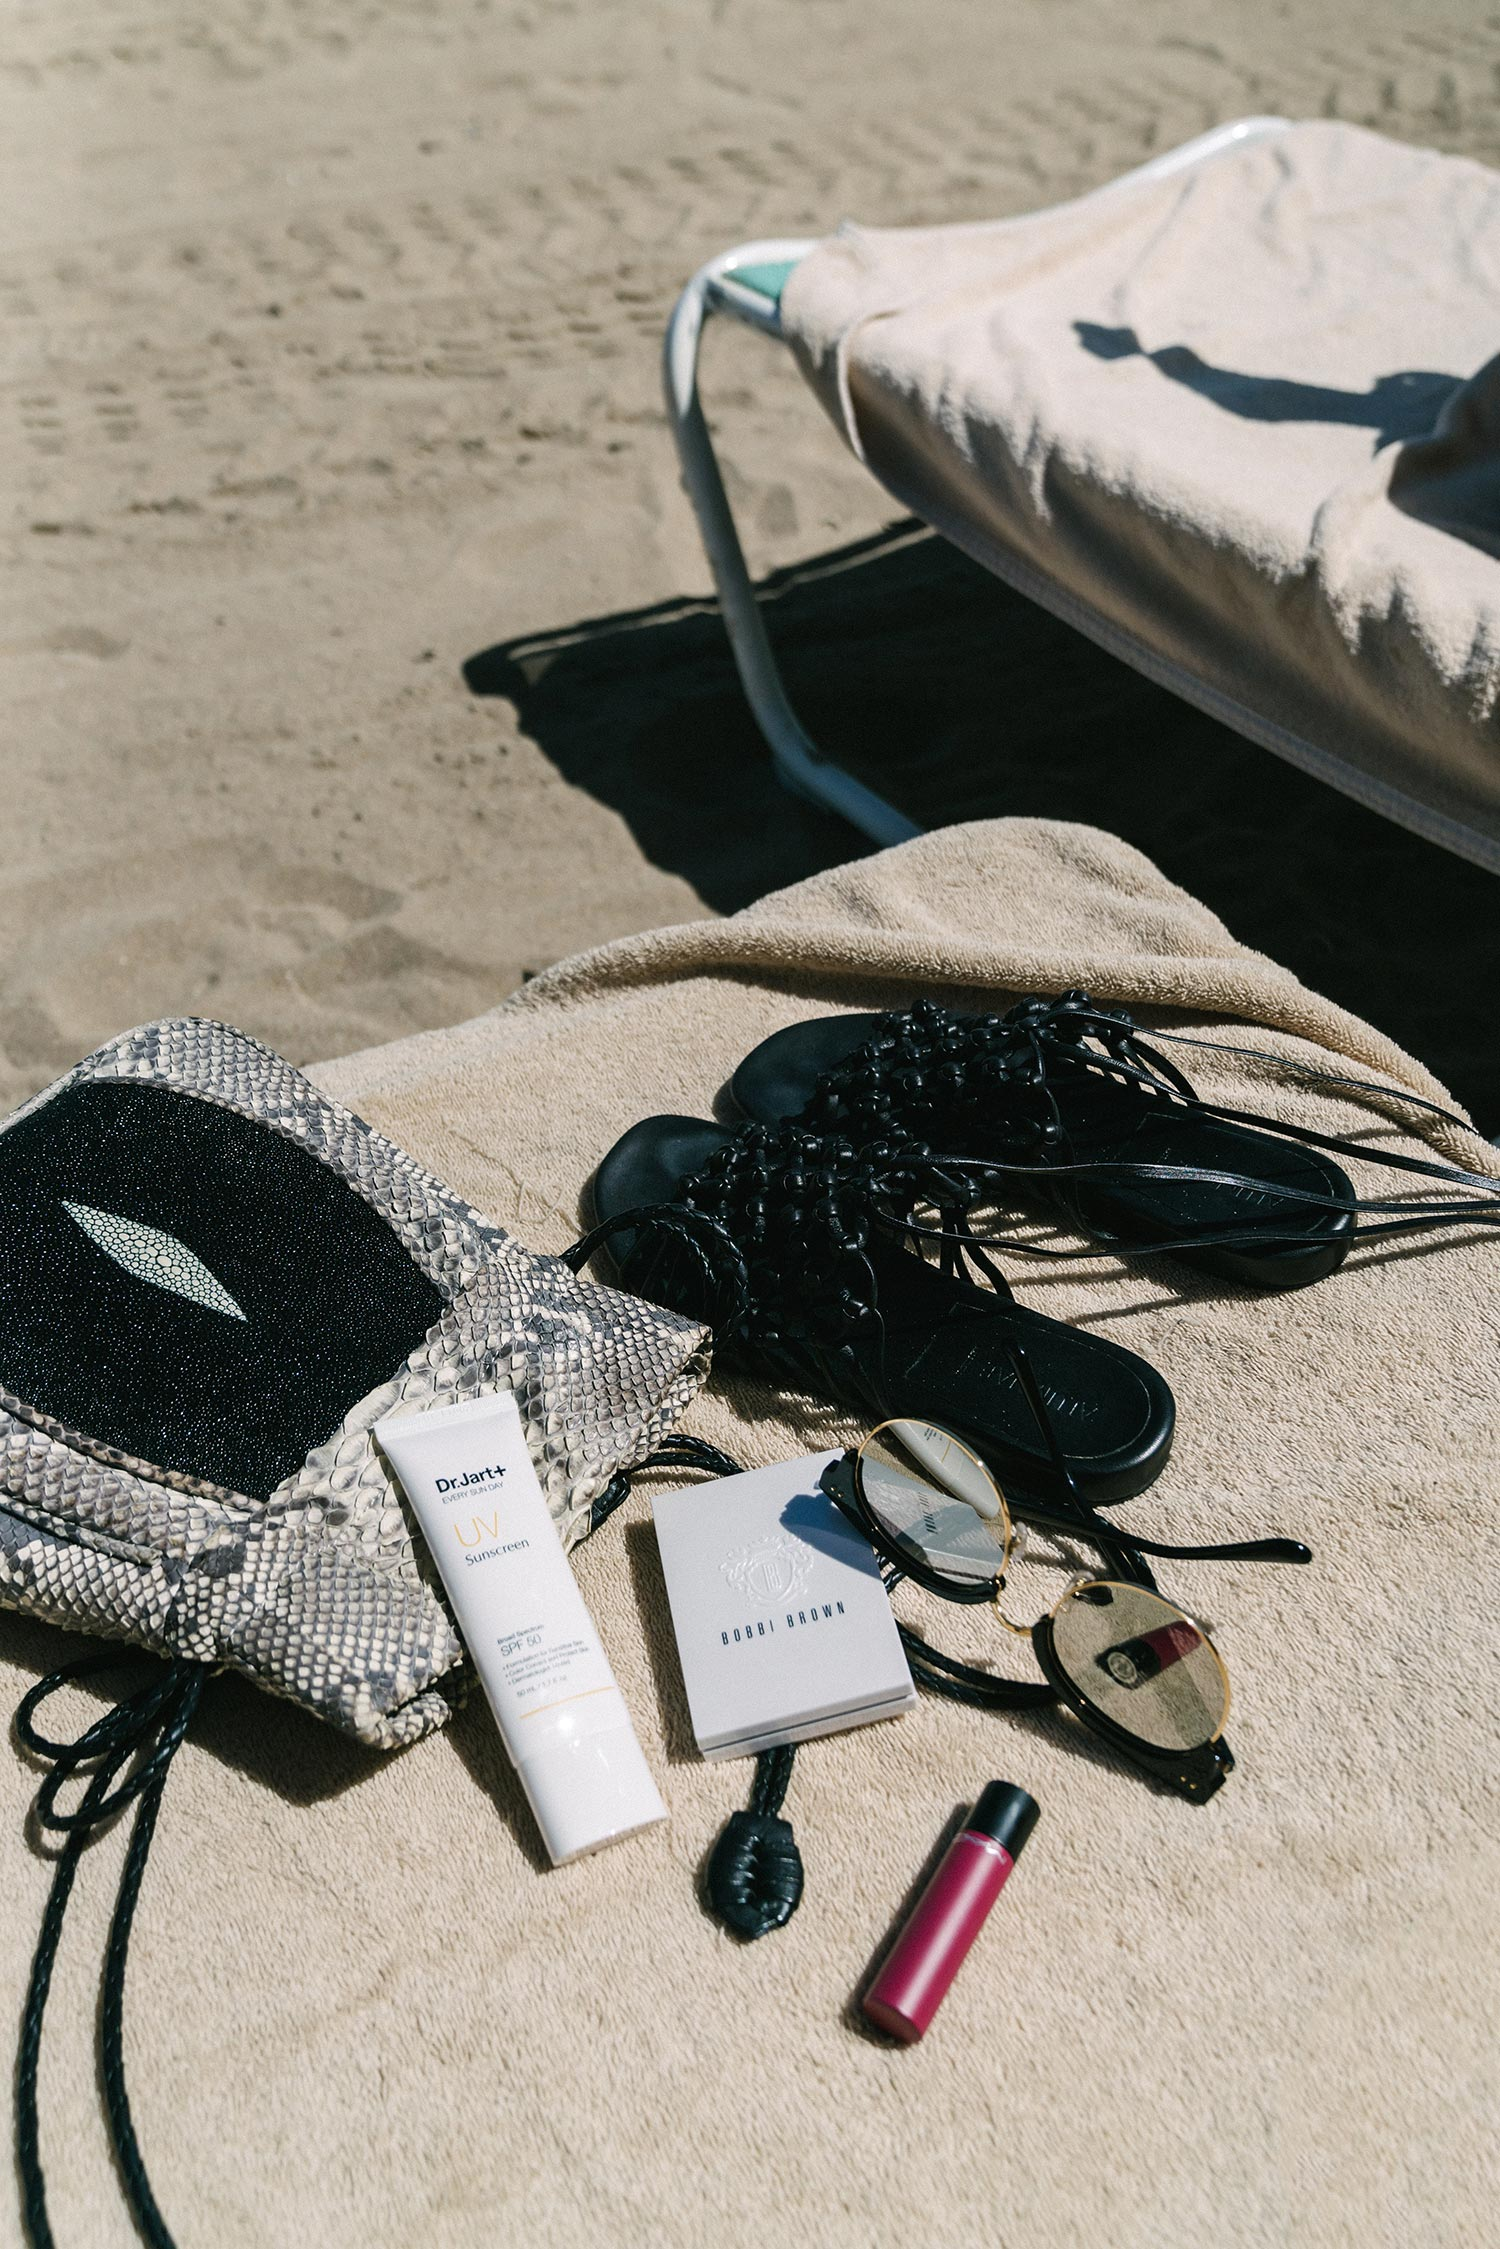 Alumnae Sandals ,  Khirma New York Bag ,  Dr. Jart+ Sunscreen ,  Bobbi Brown Palette ,  MAC Lipstick ,  Gentle Monster Sunglasses ,